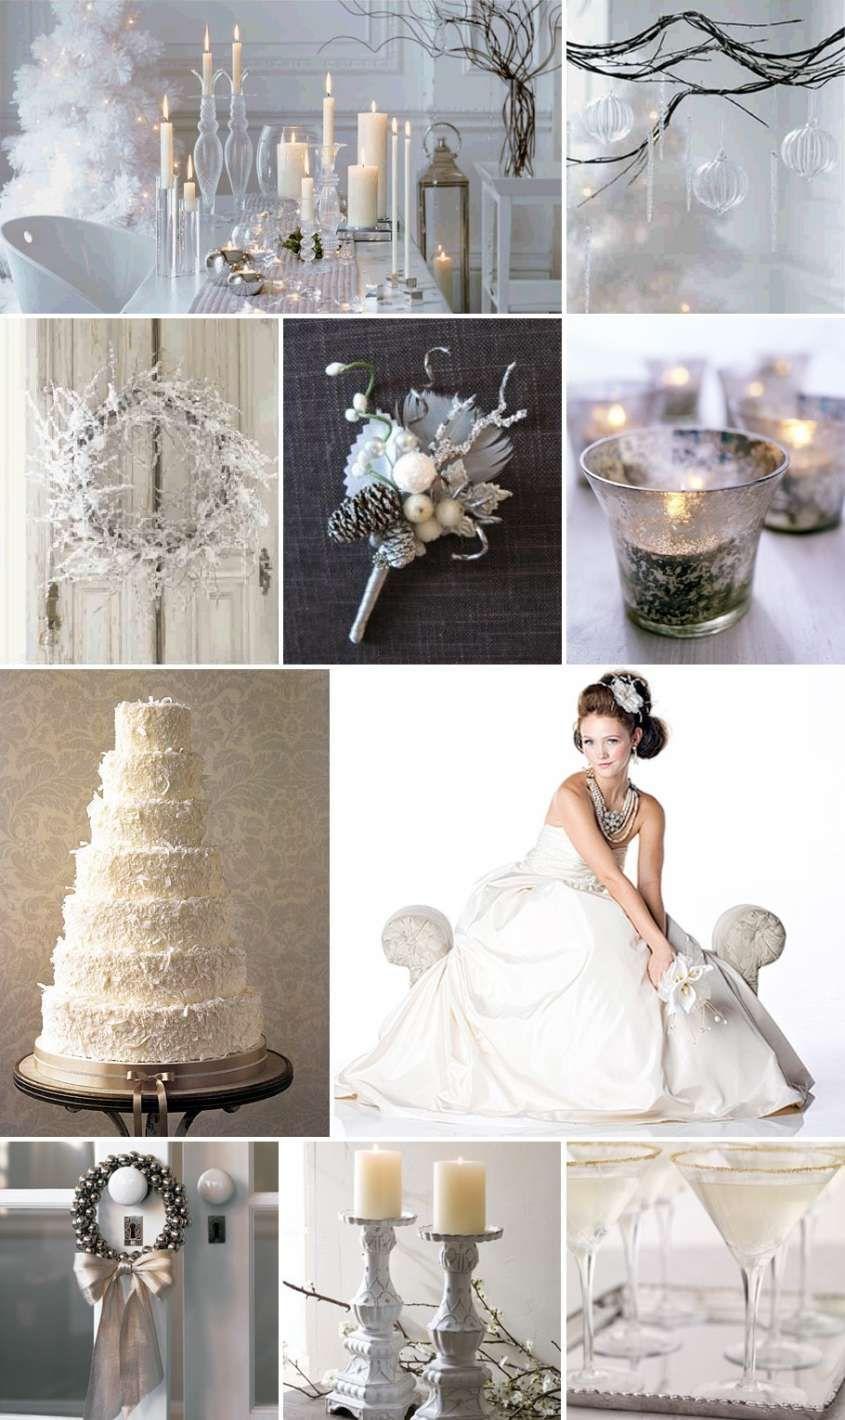 Matrimonio A Natale Idee : Matrimonio a natale idee matrimonio a natale in bianco Ślubne